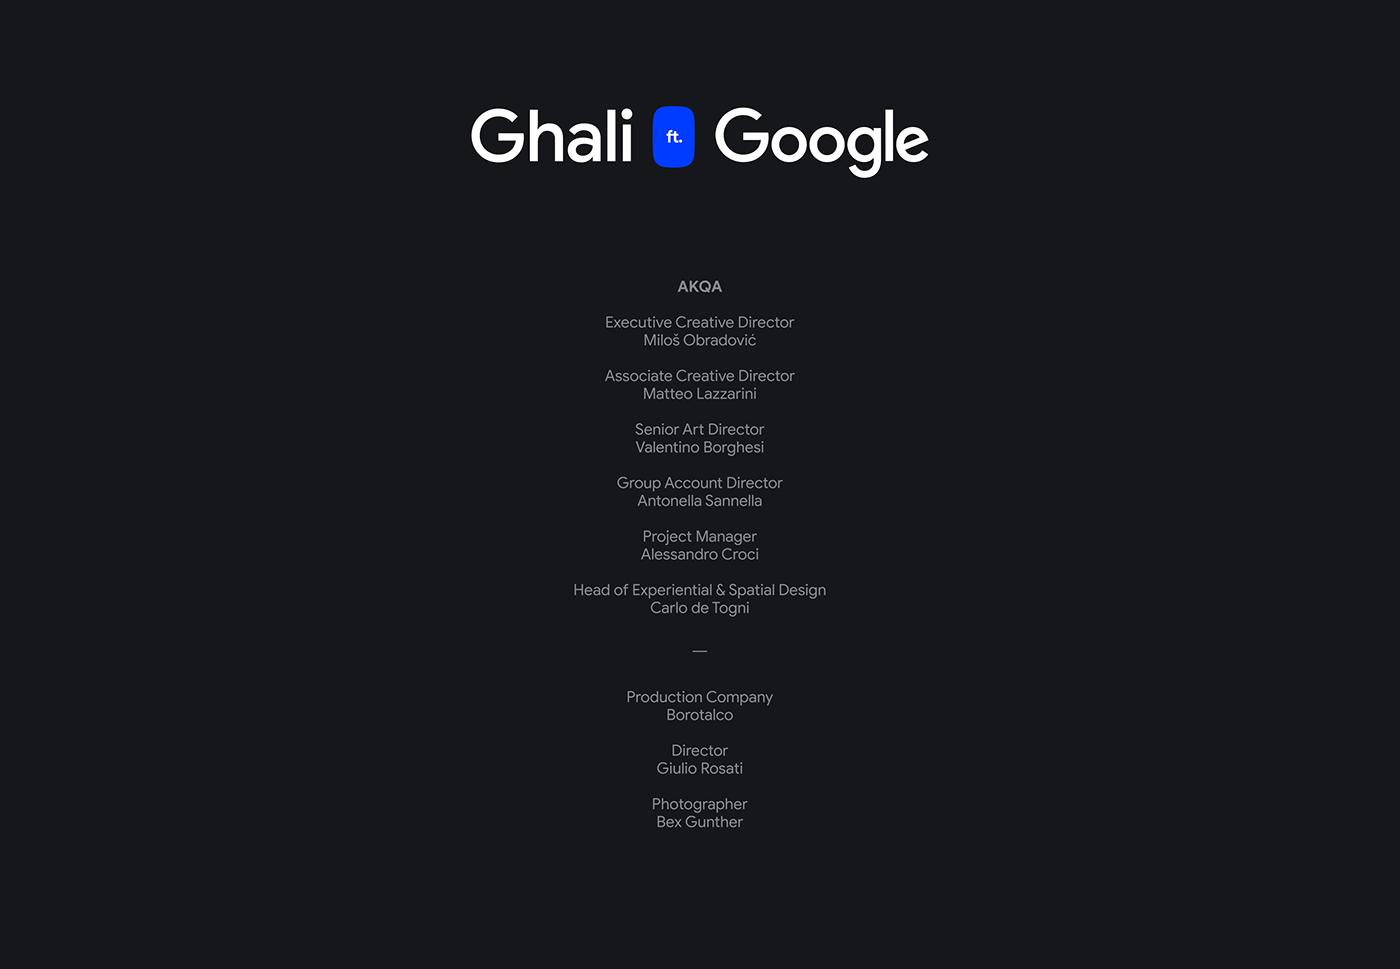 concert Experience ghali google immersive motion design Voice assistant